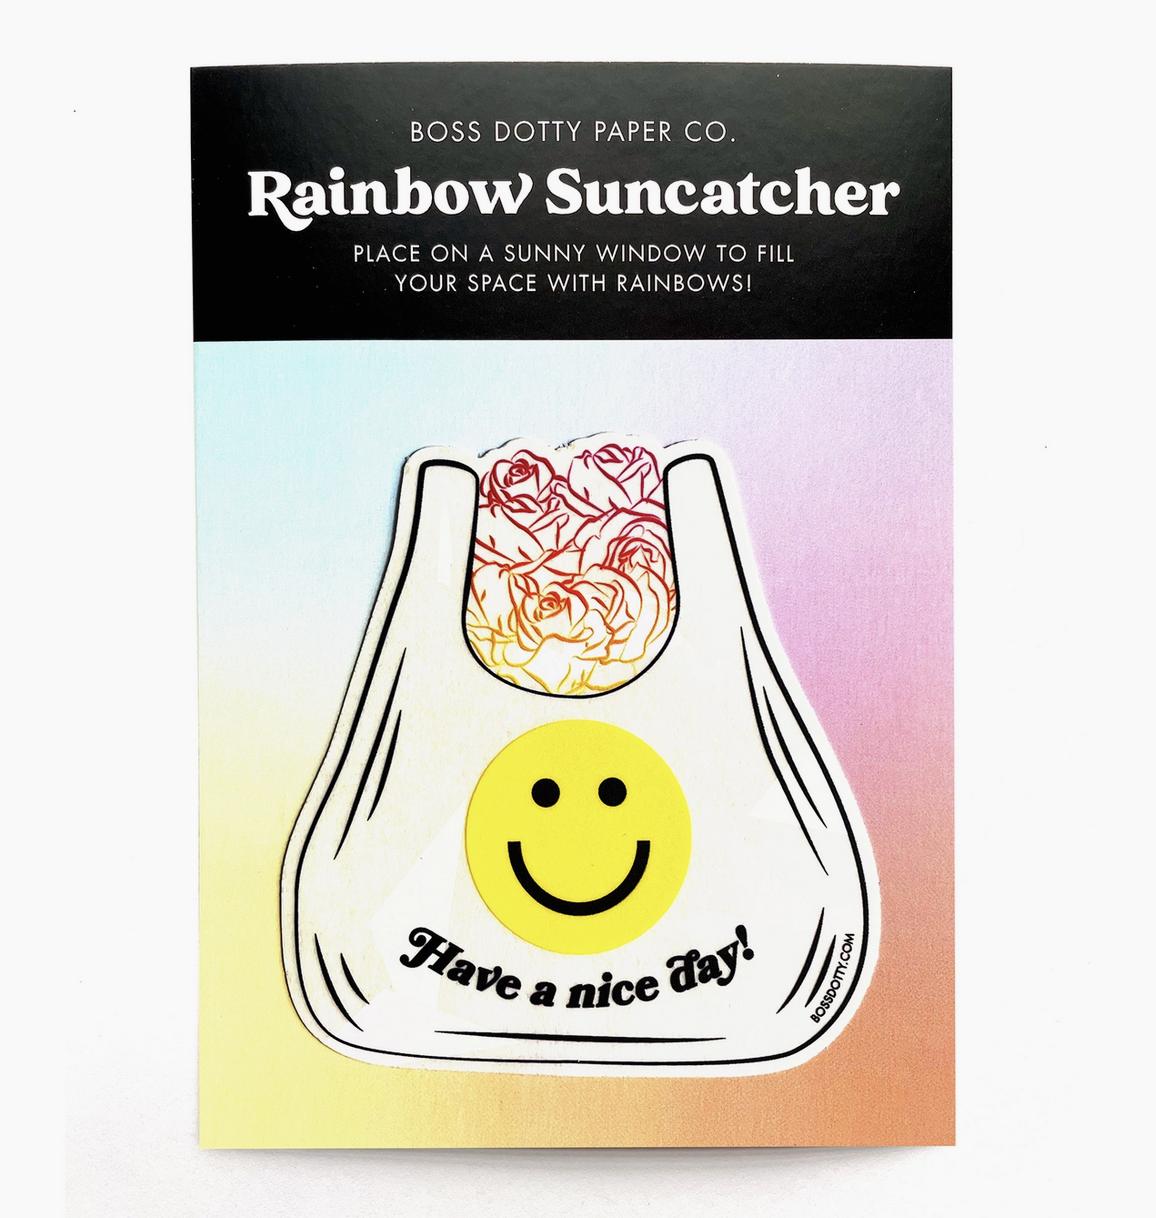 Boss Dotty Nice Day Rainbow Suncatcher